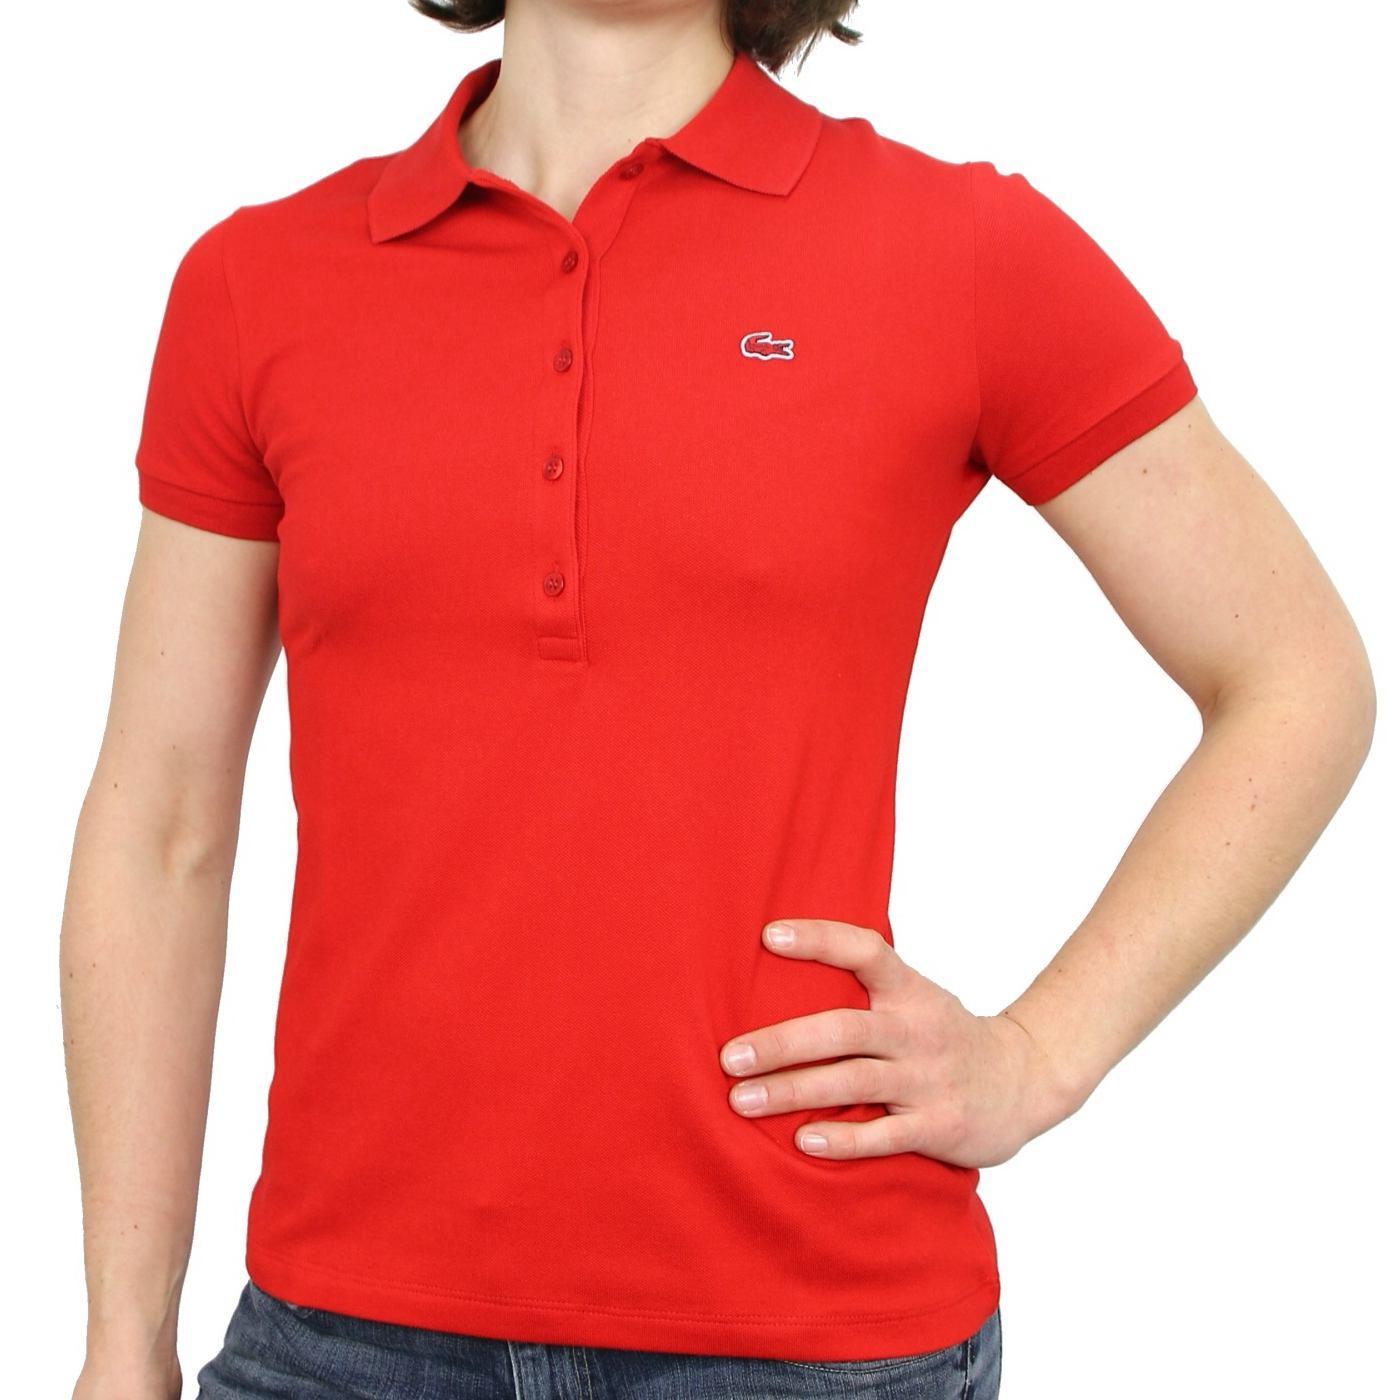 Cheap lacoste polo shirts ebay for Lacoste polo shirts ebay